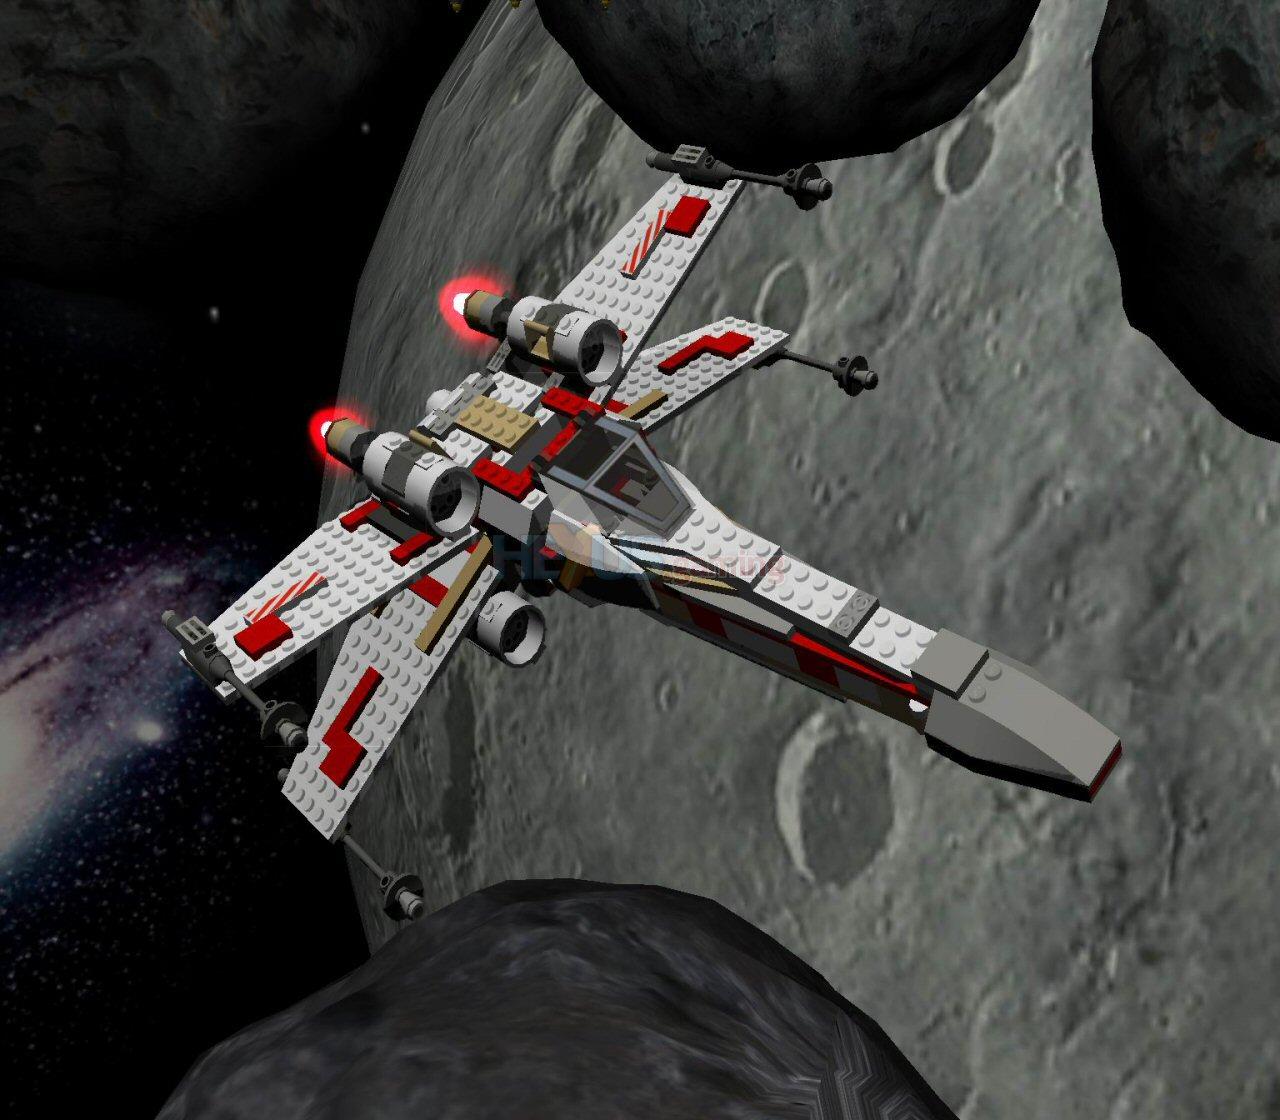 Lego Star Wars Ii The Original Trilogy Pc Feature Hexus Net